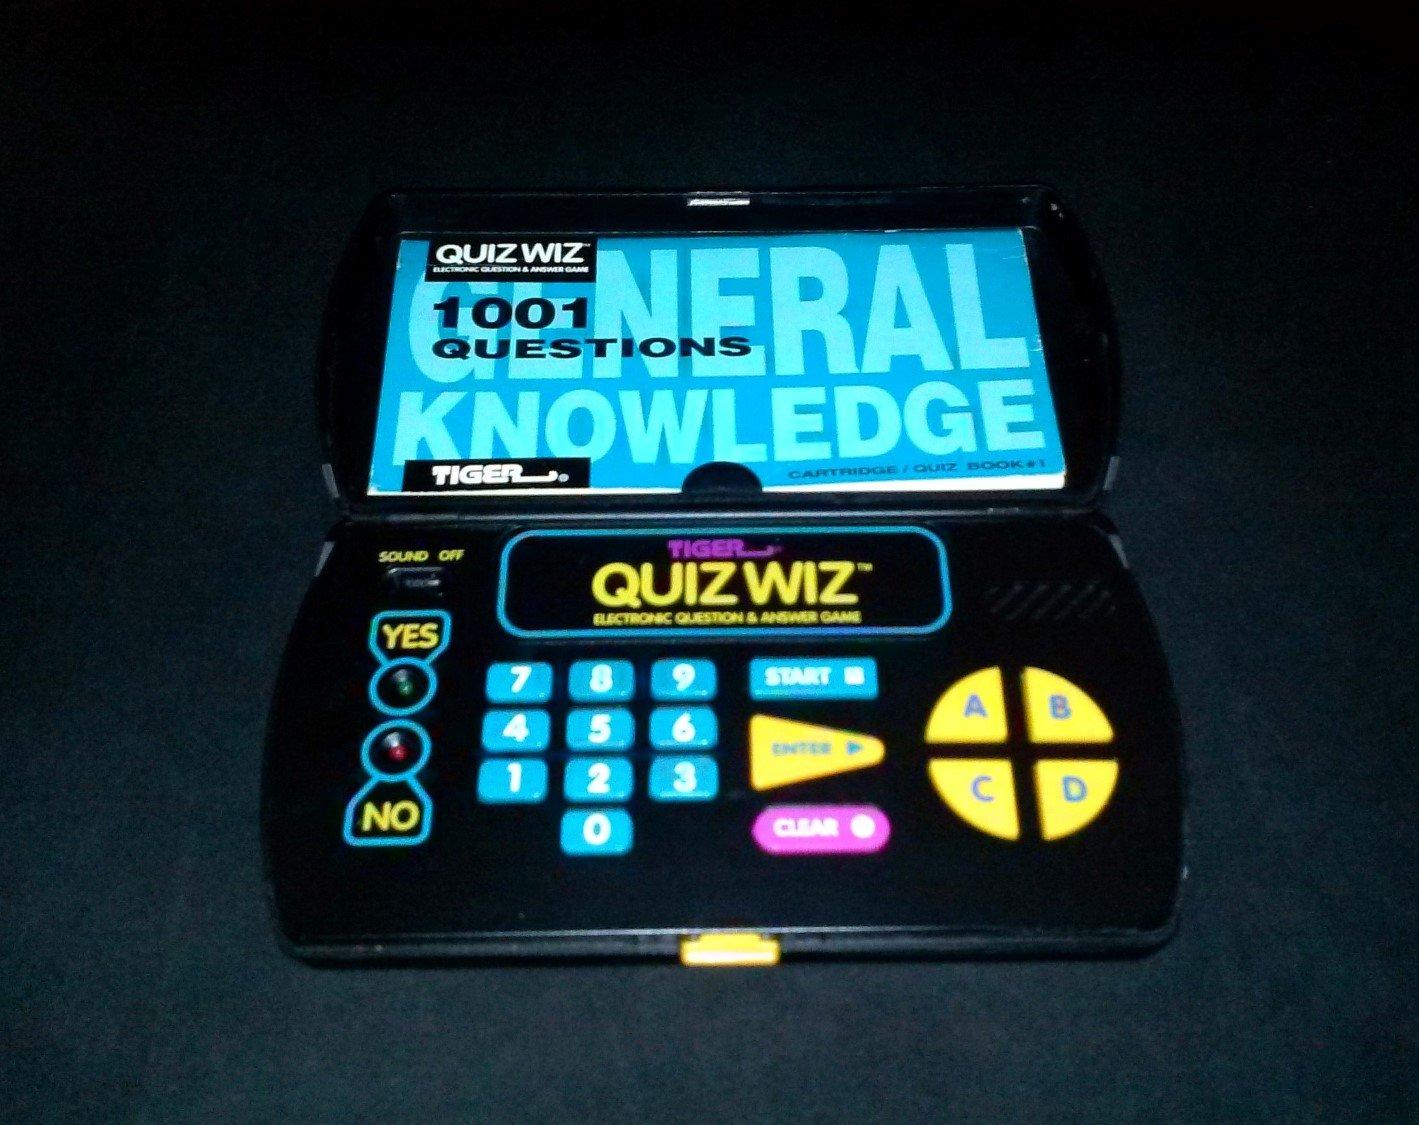 Quiz Wiz - Vintage Handheld - Tiger Electronics 1993 - With General Knowledge Book & Cartridge